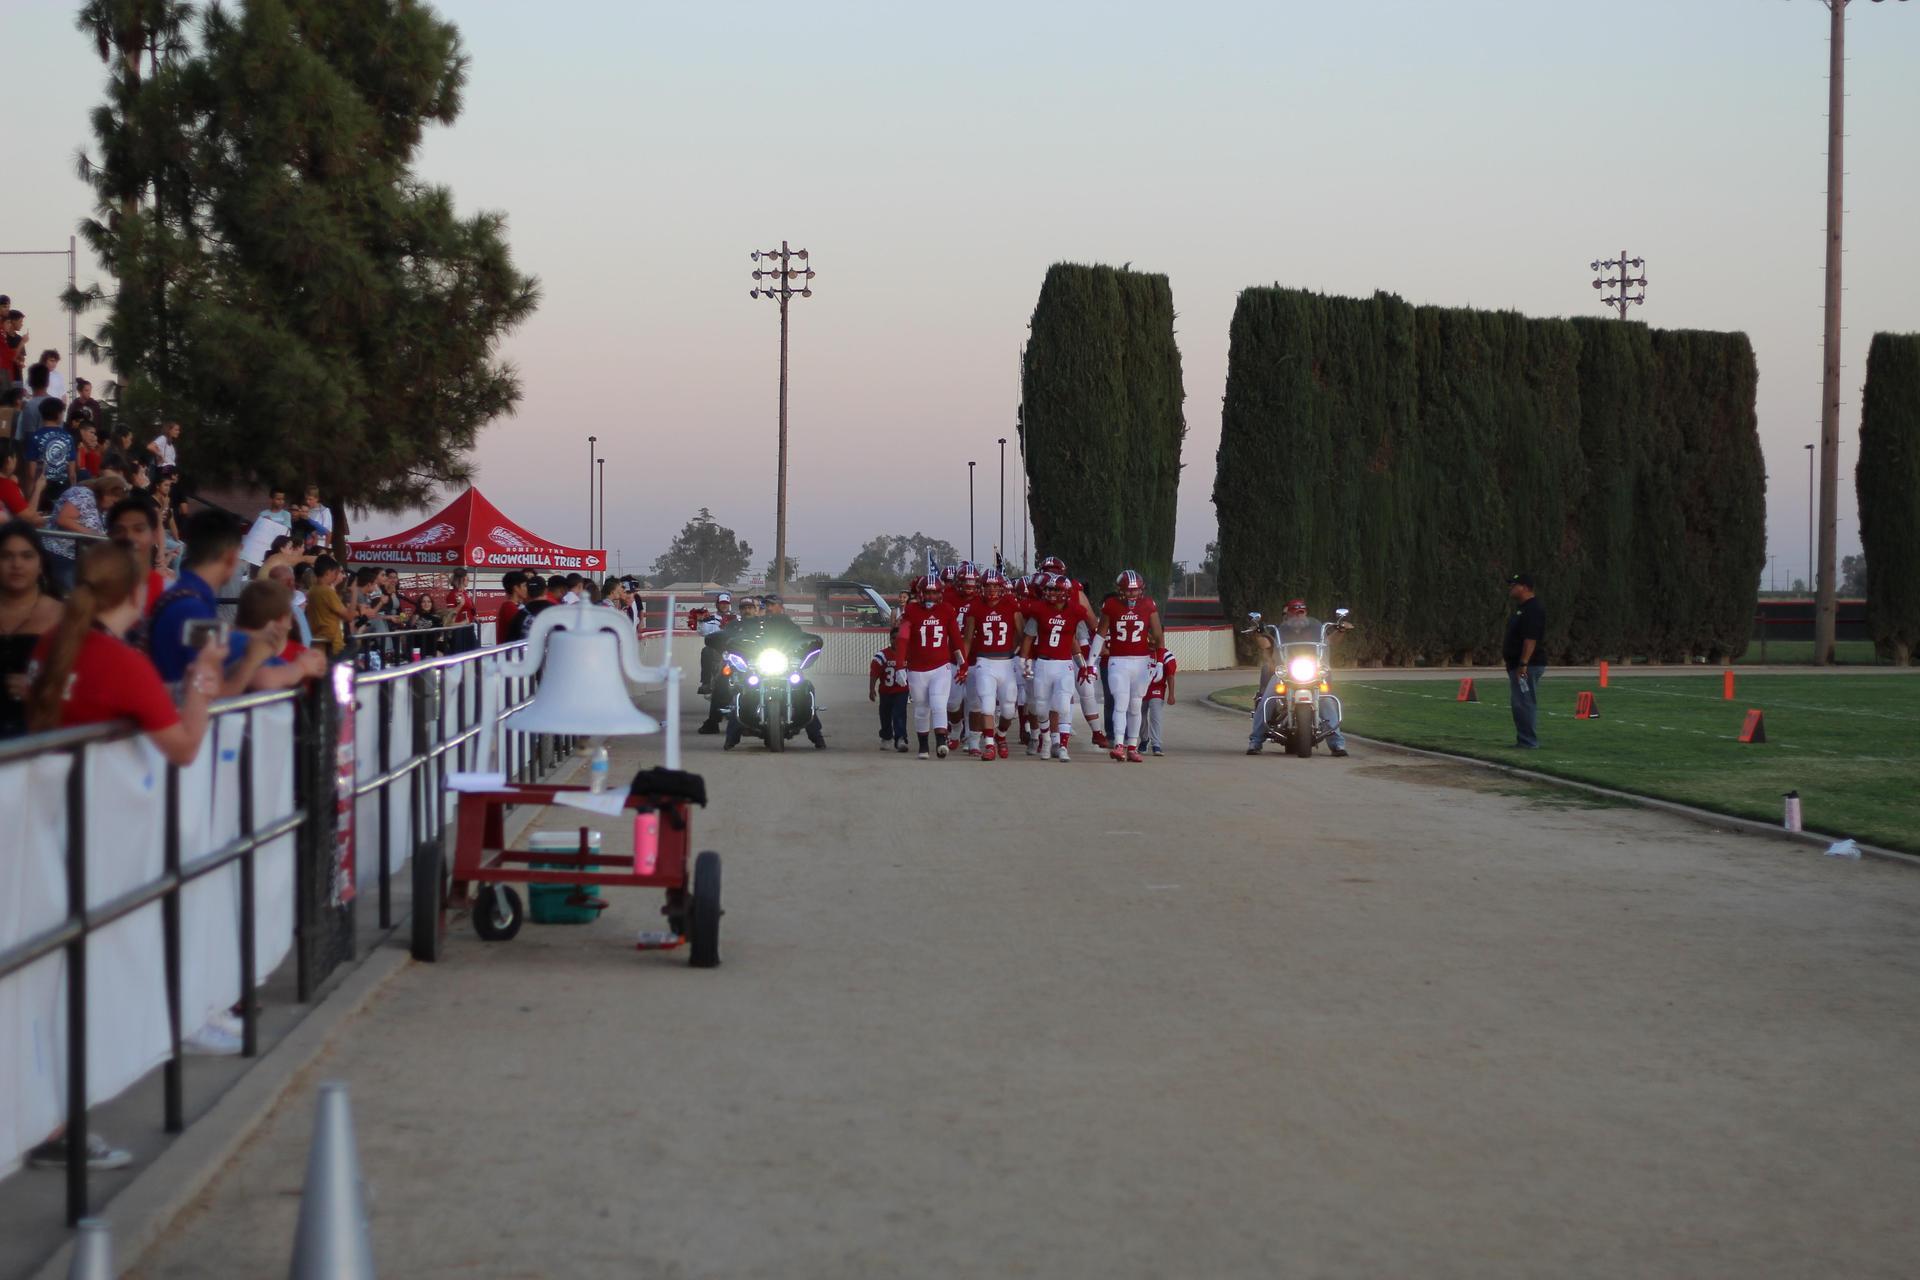 Football player's pregame festivities